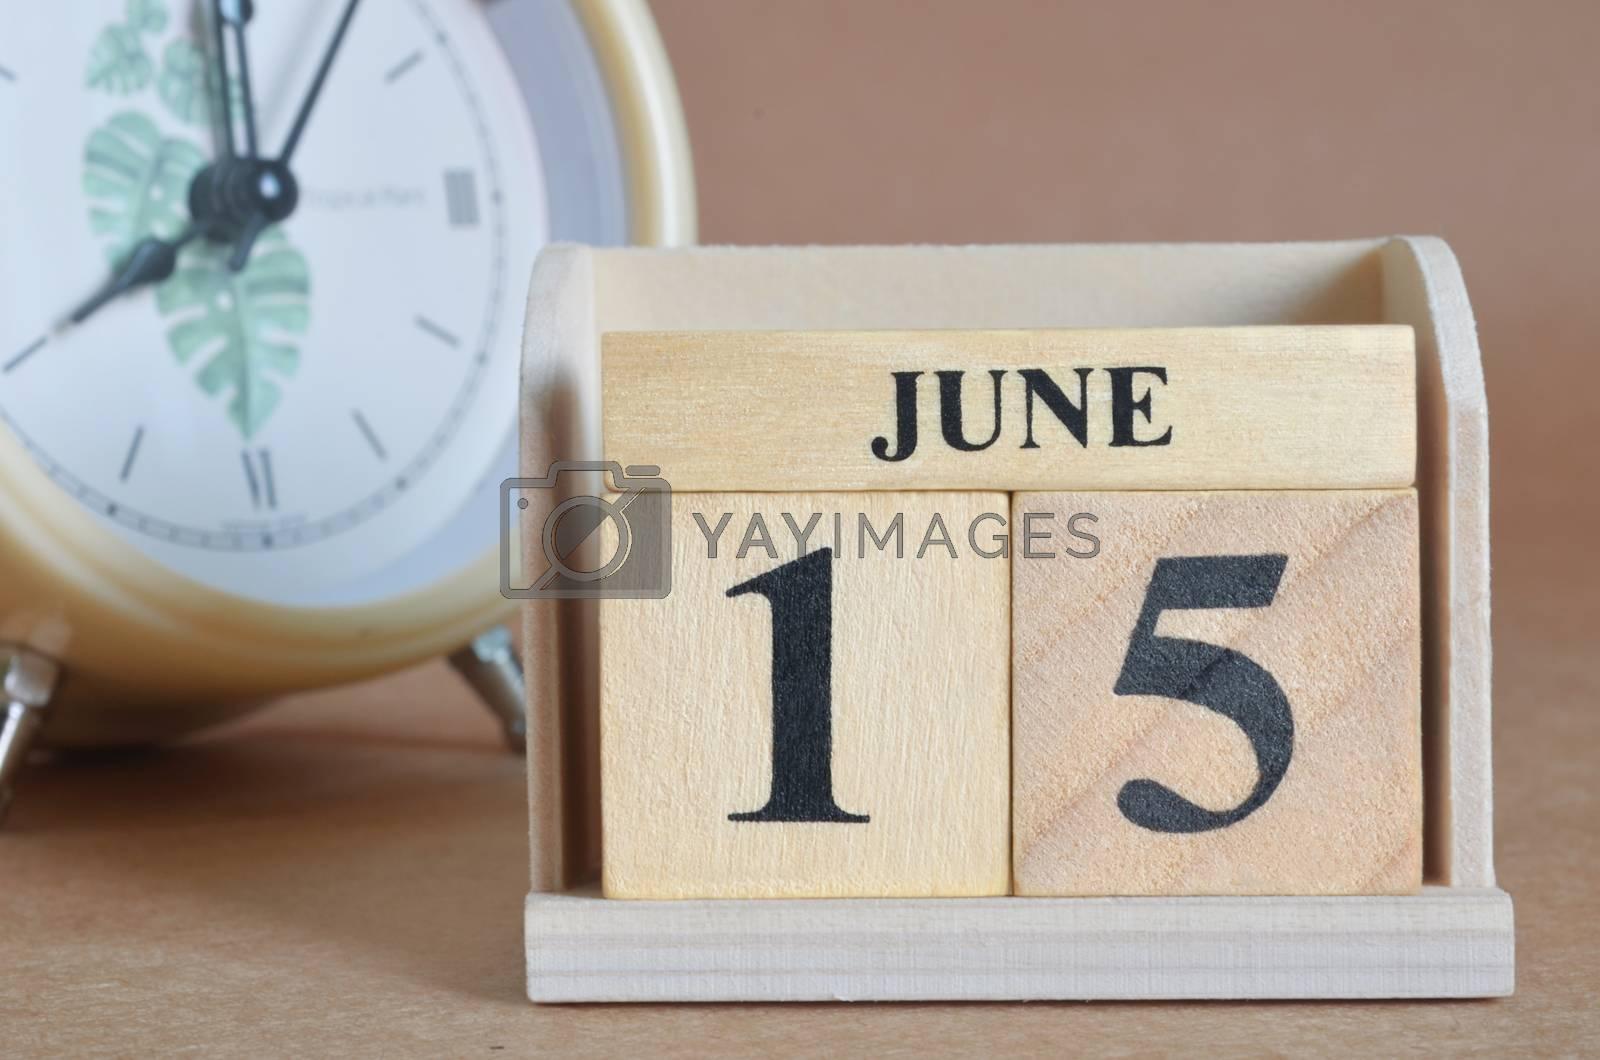 June 15 by Mrfrost